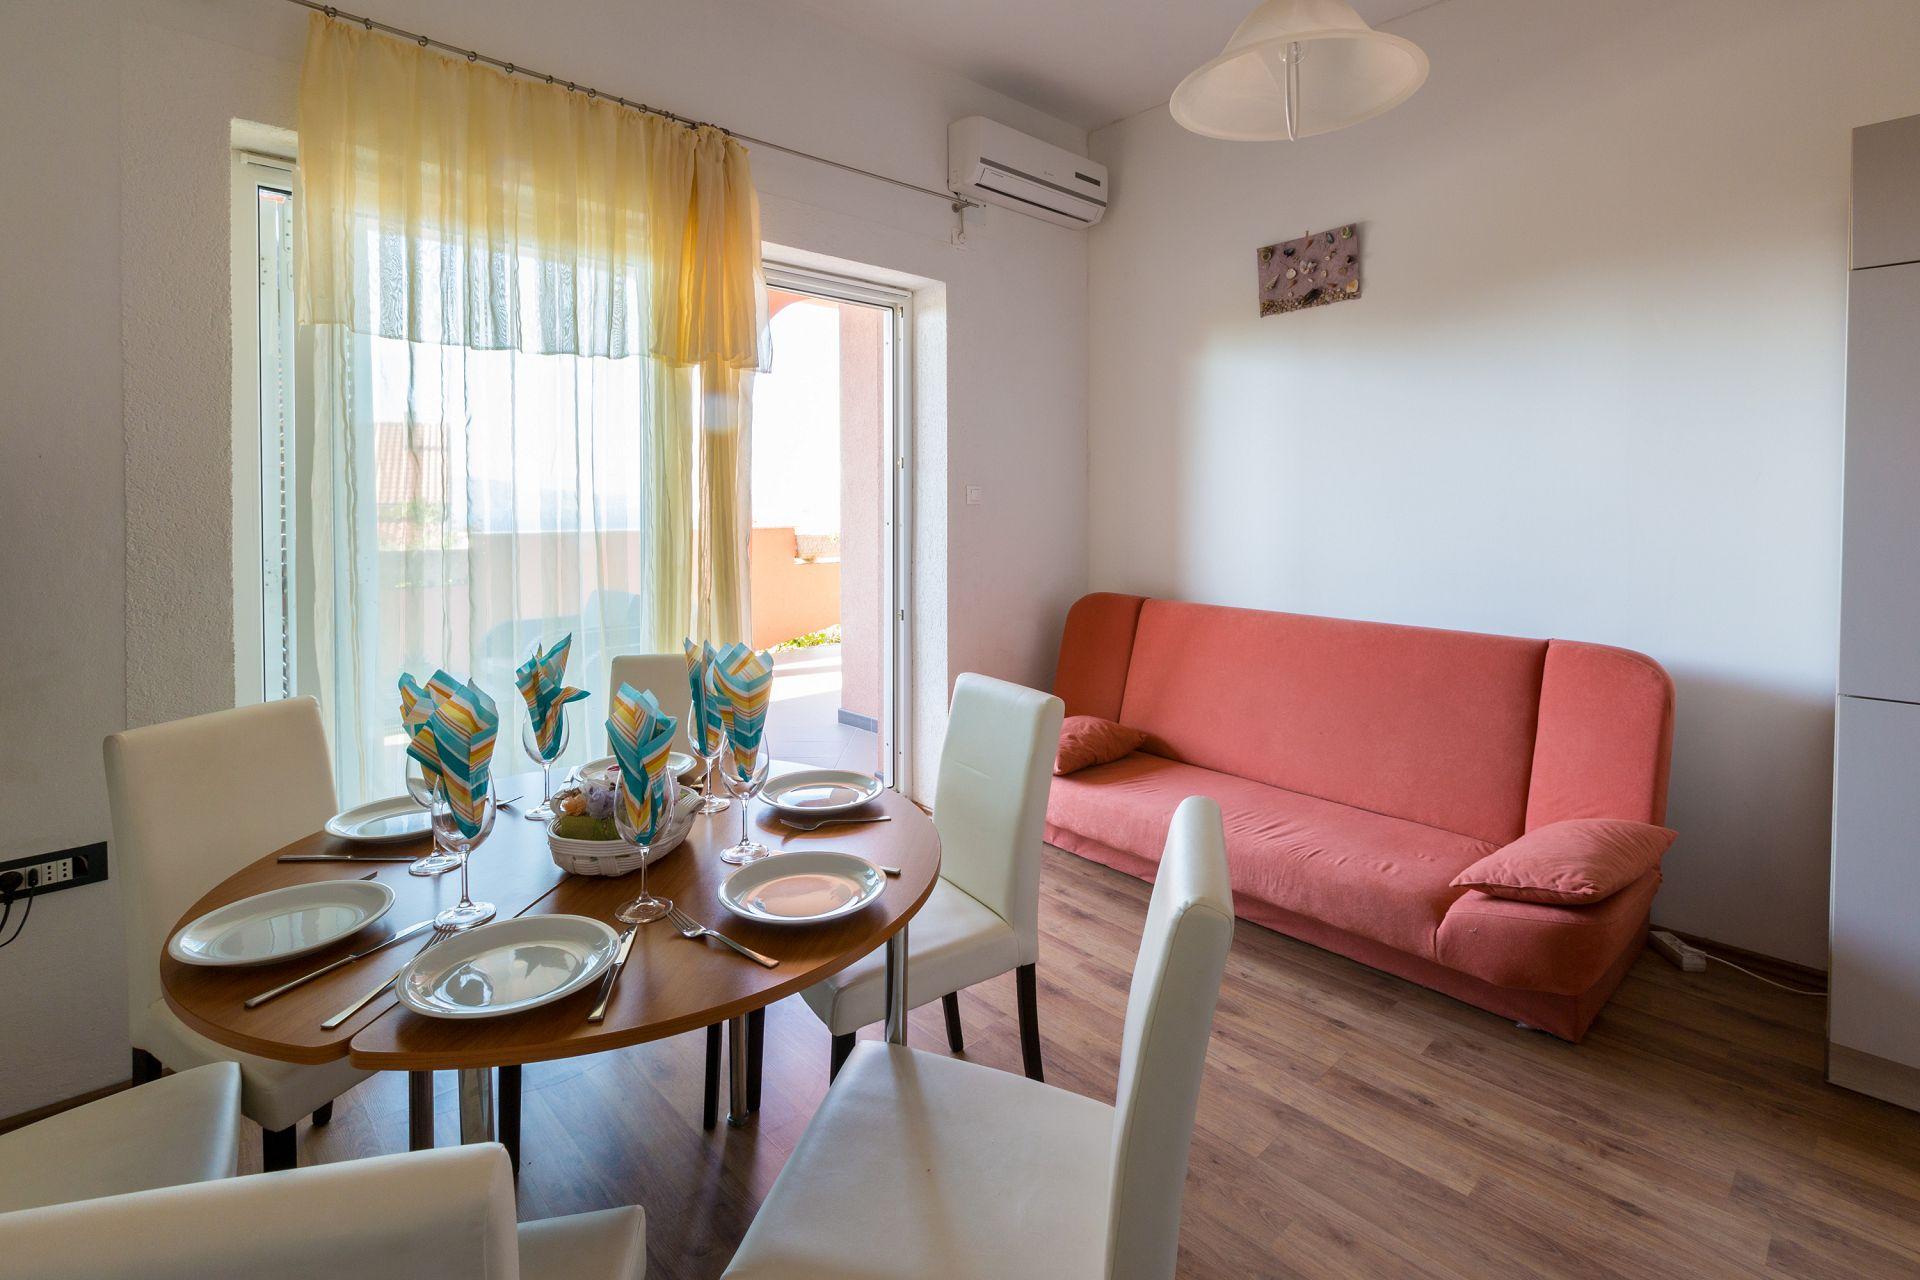 A3 dvosobni(5+1): living room